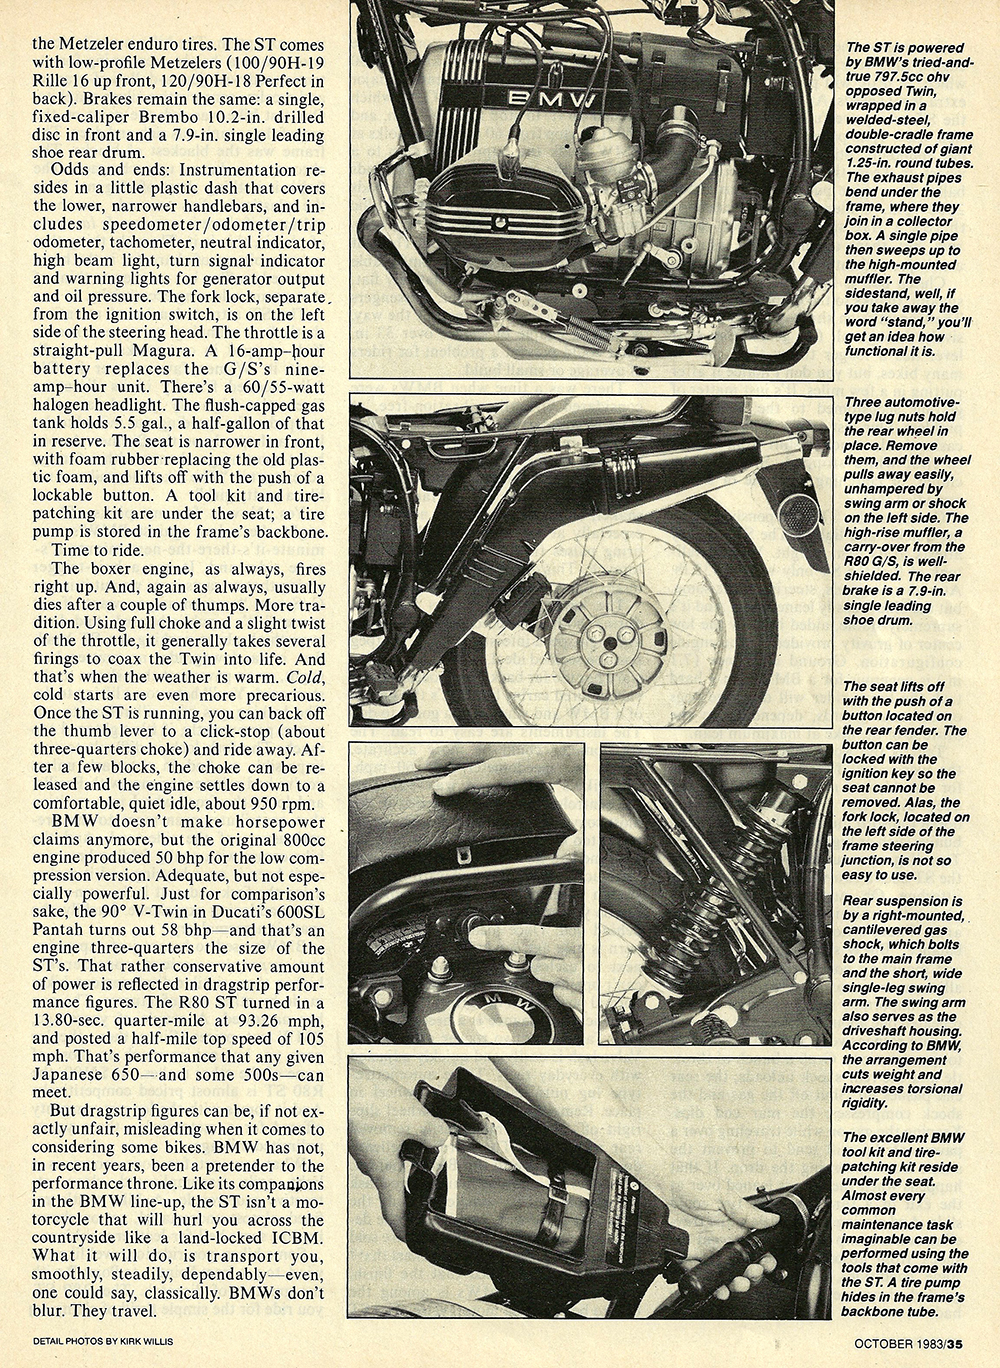 1983 BMW R80ST road test — Ye Olde Cycle Shoppe